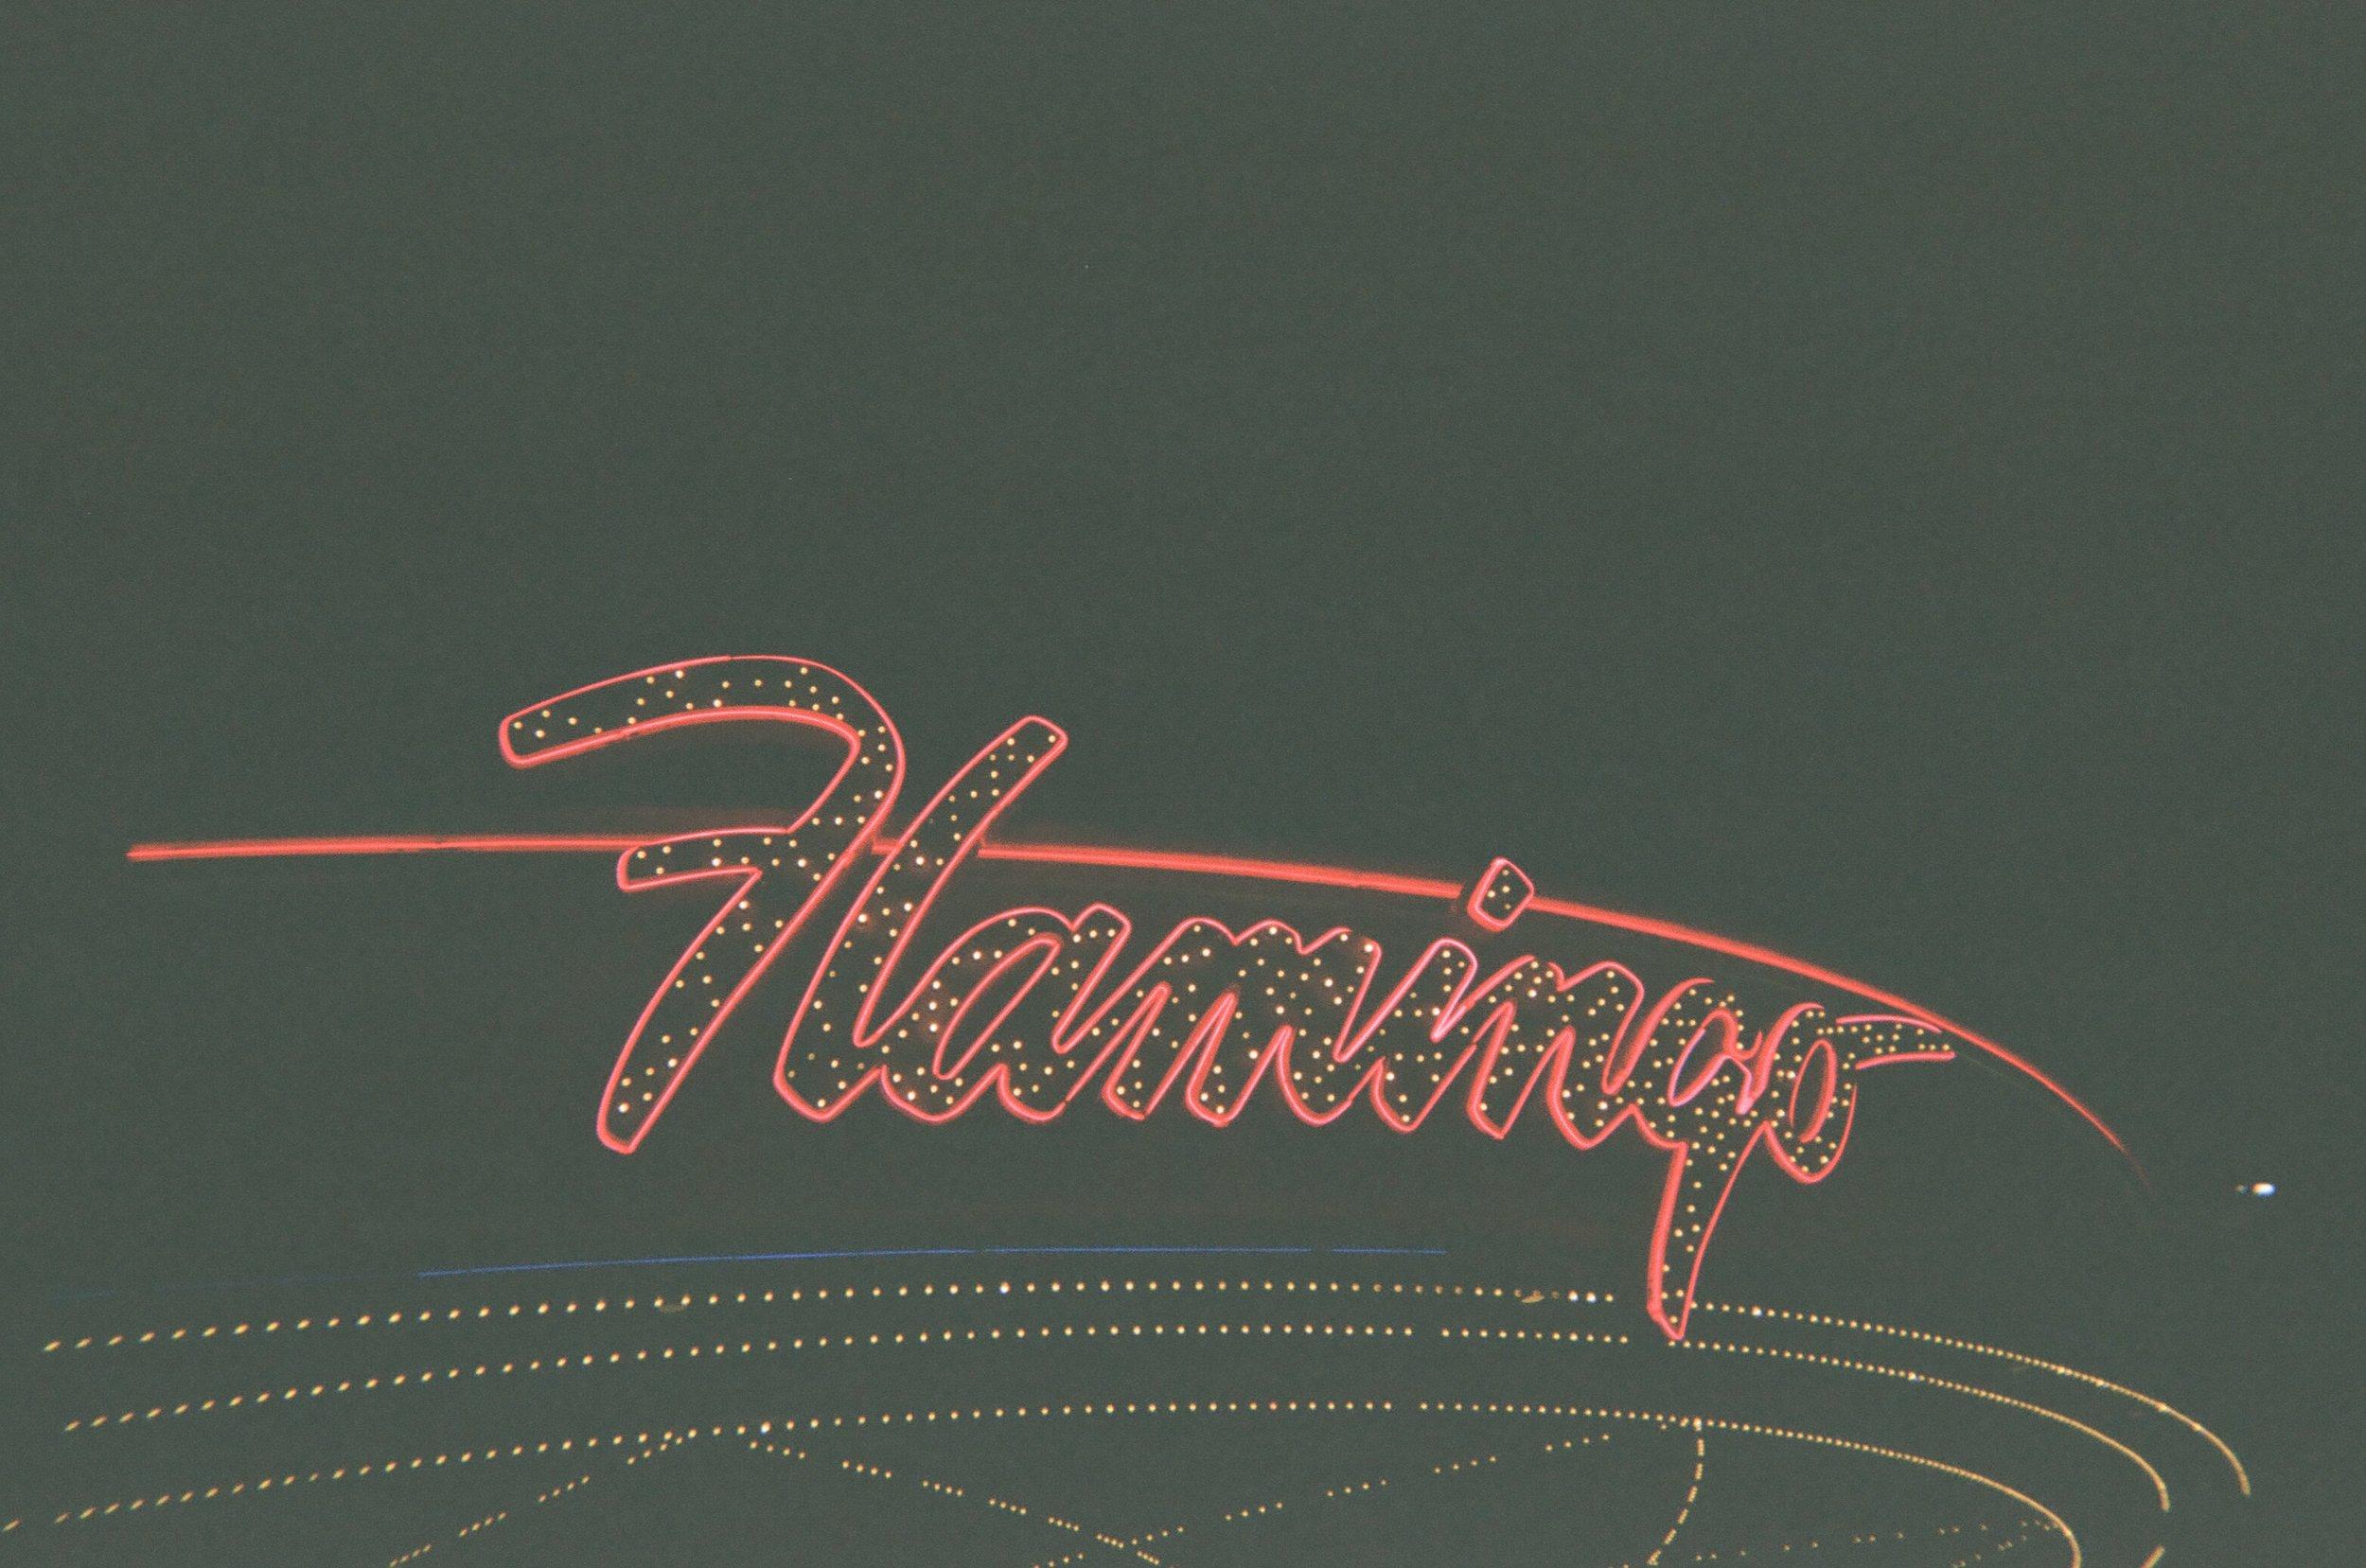 Las-Vegas-Strip-Flamingo-Casino